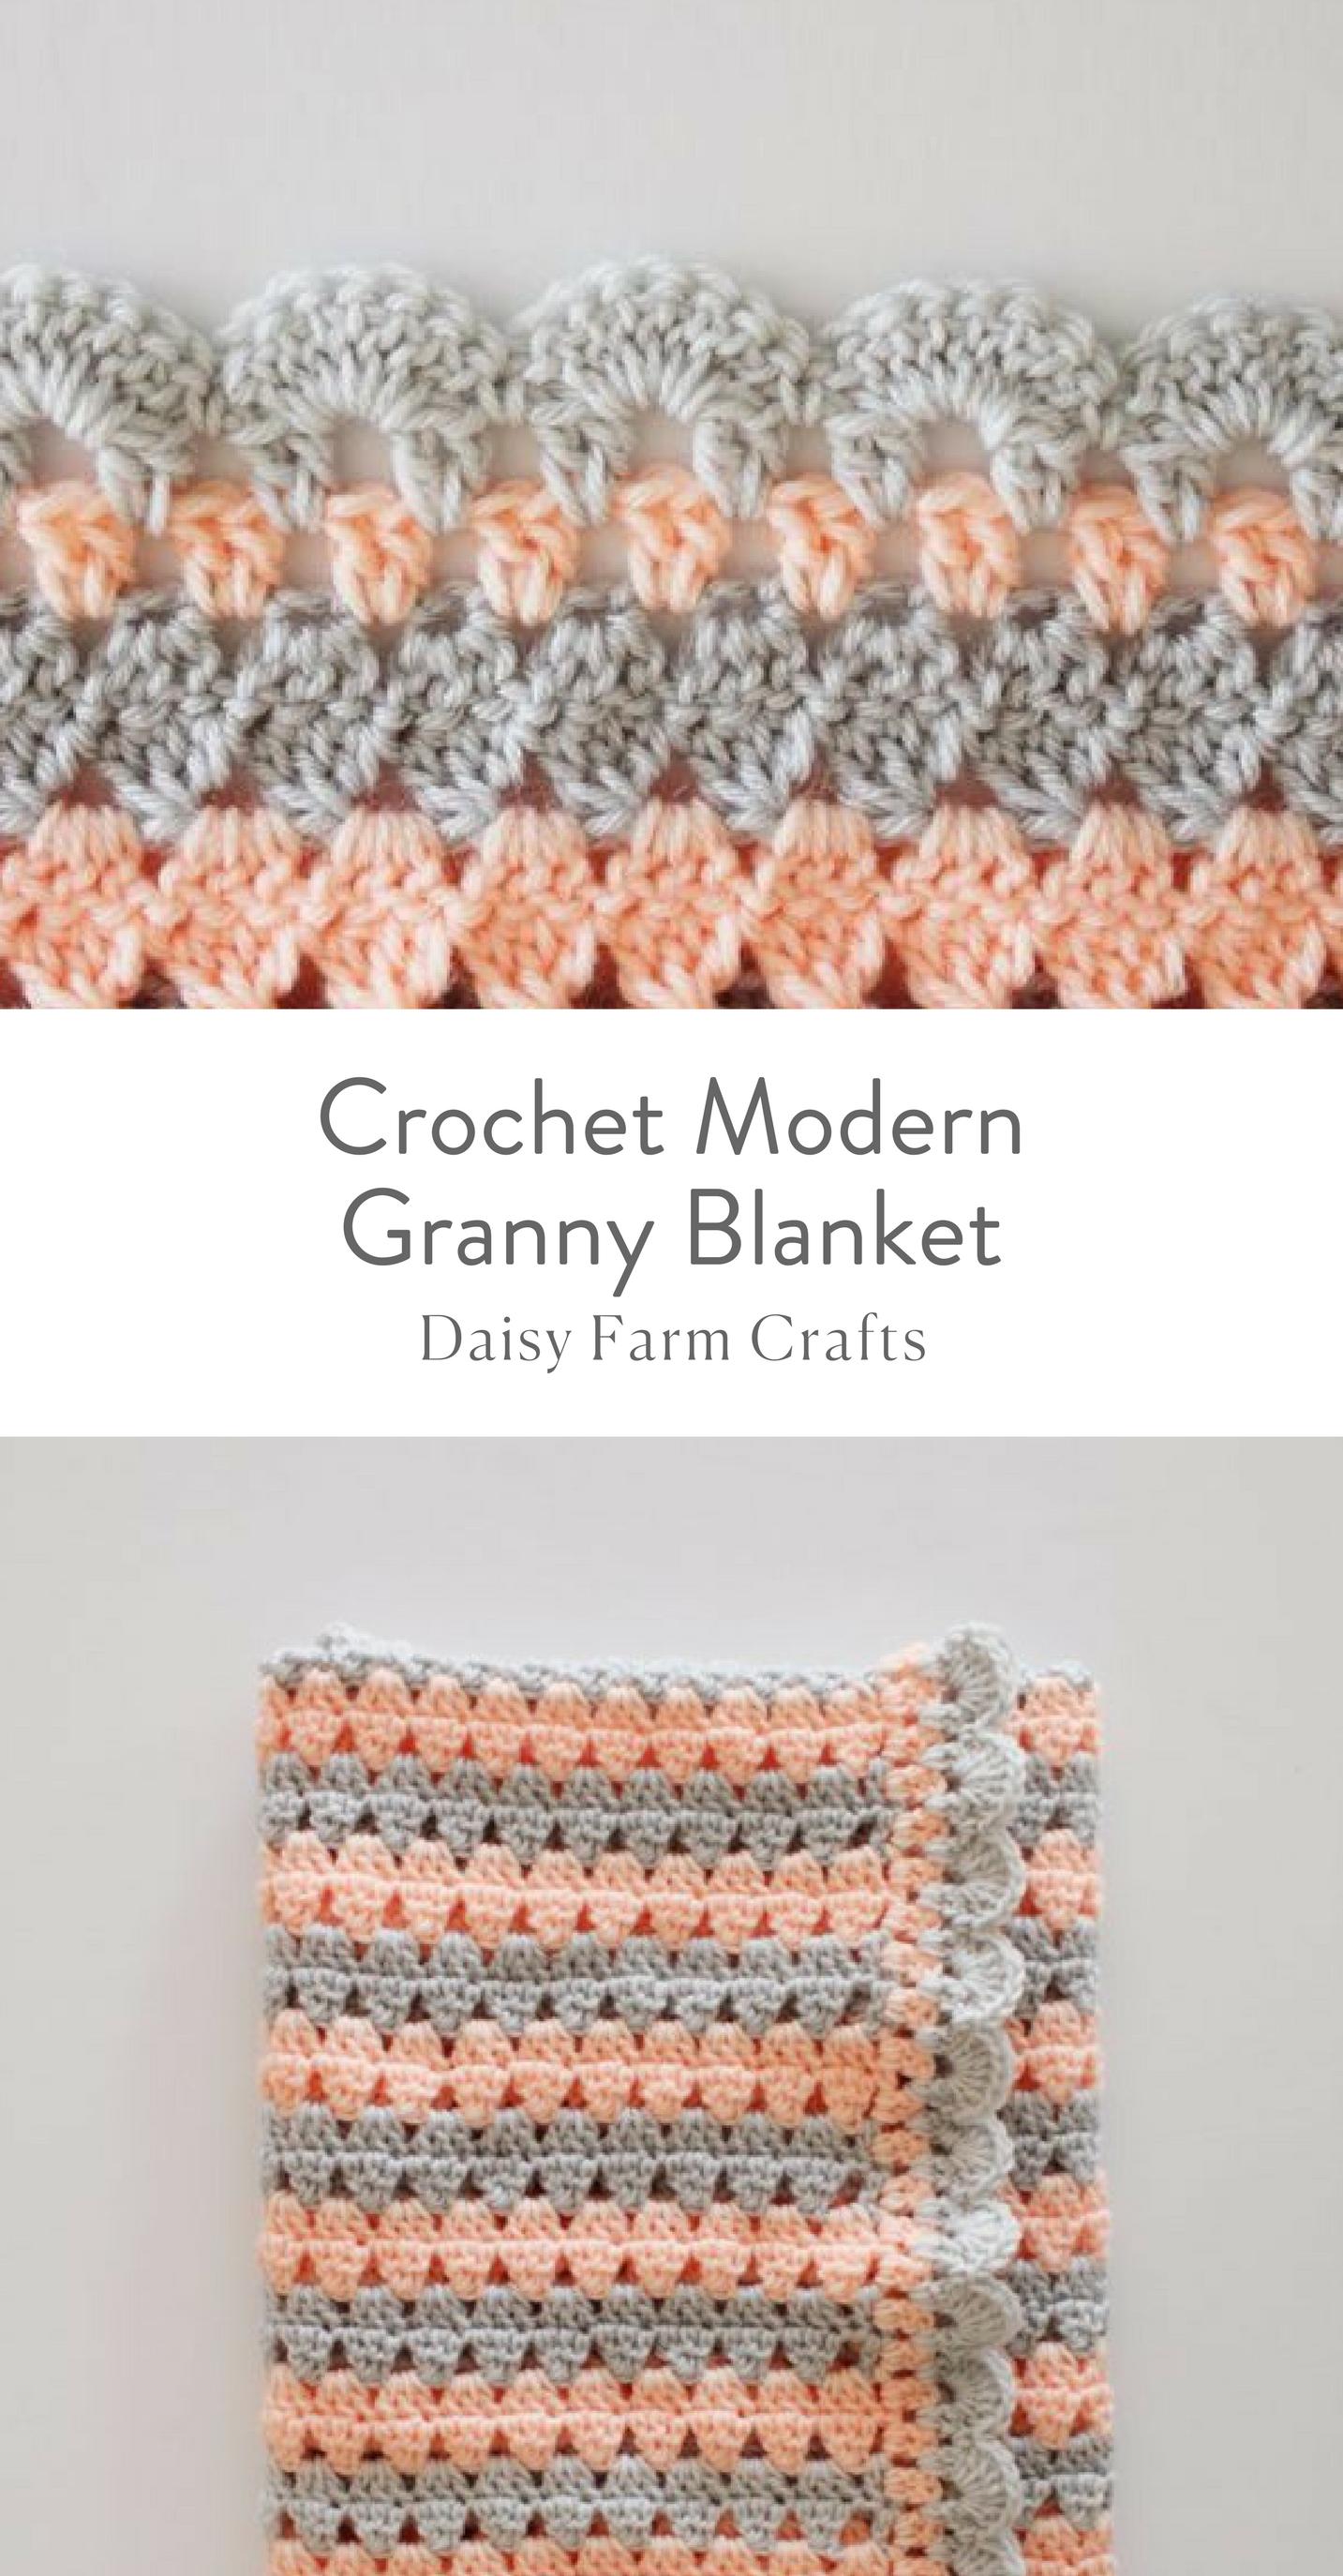 Free Pattern - Crochet Modern Granny Blanket | szydelko | Pinterest ...